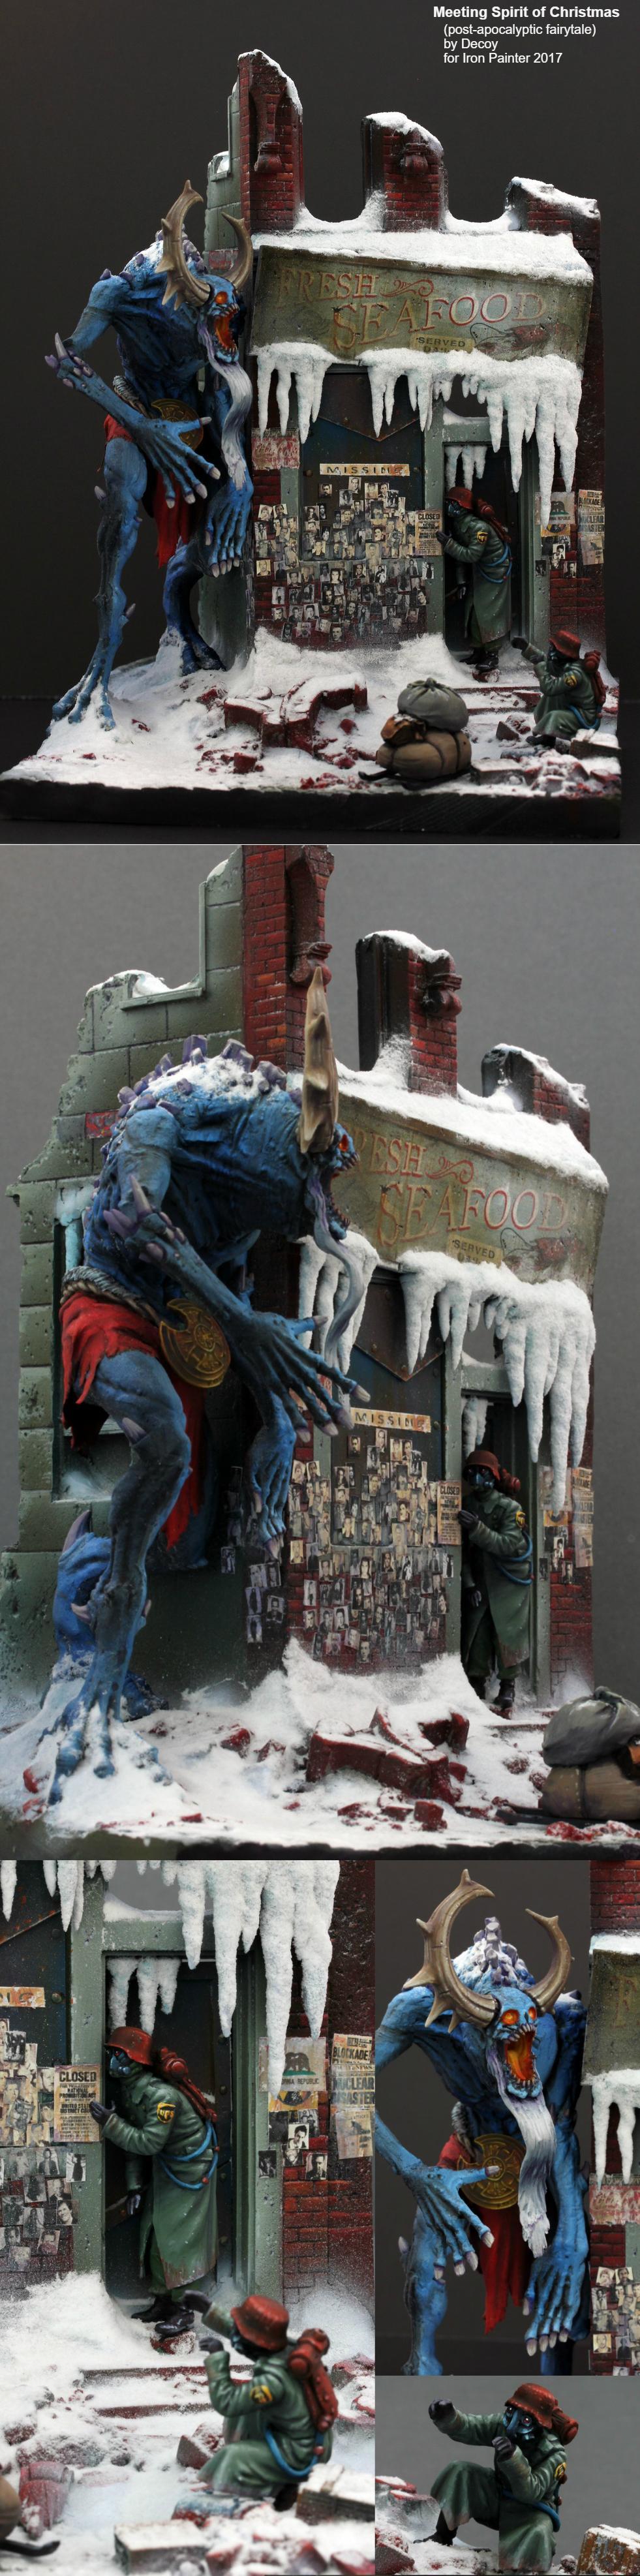 Competition, Diorama, Iron Painter, Kingdom Death, Warhammer Fantasy